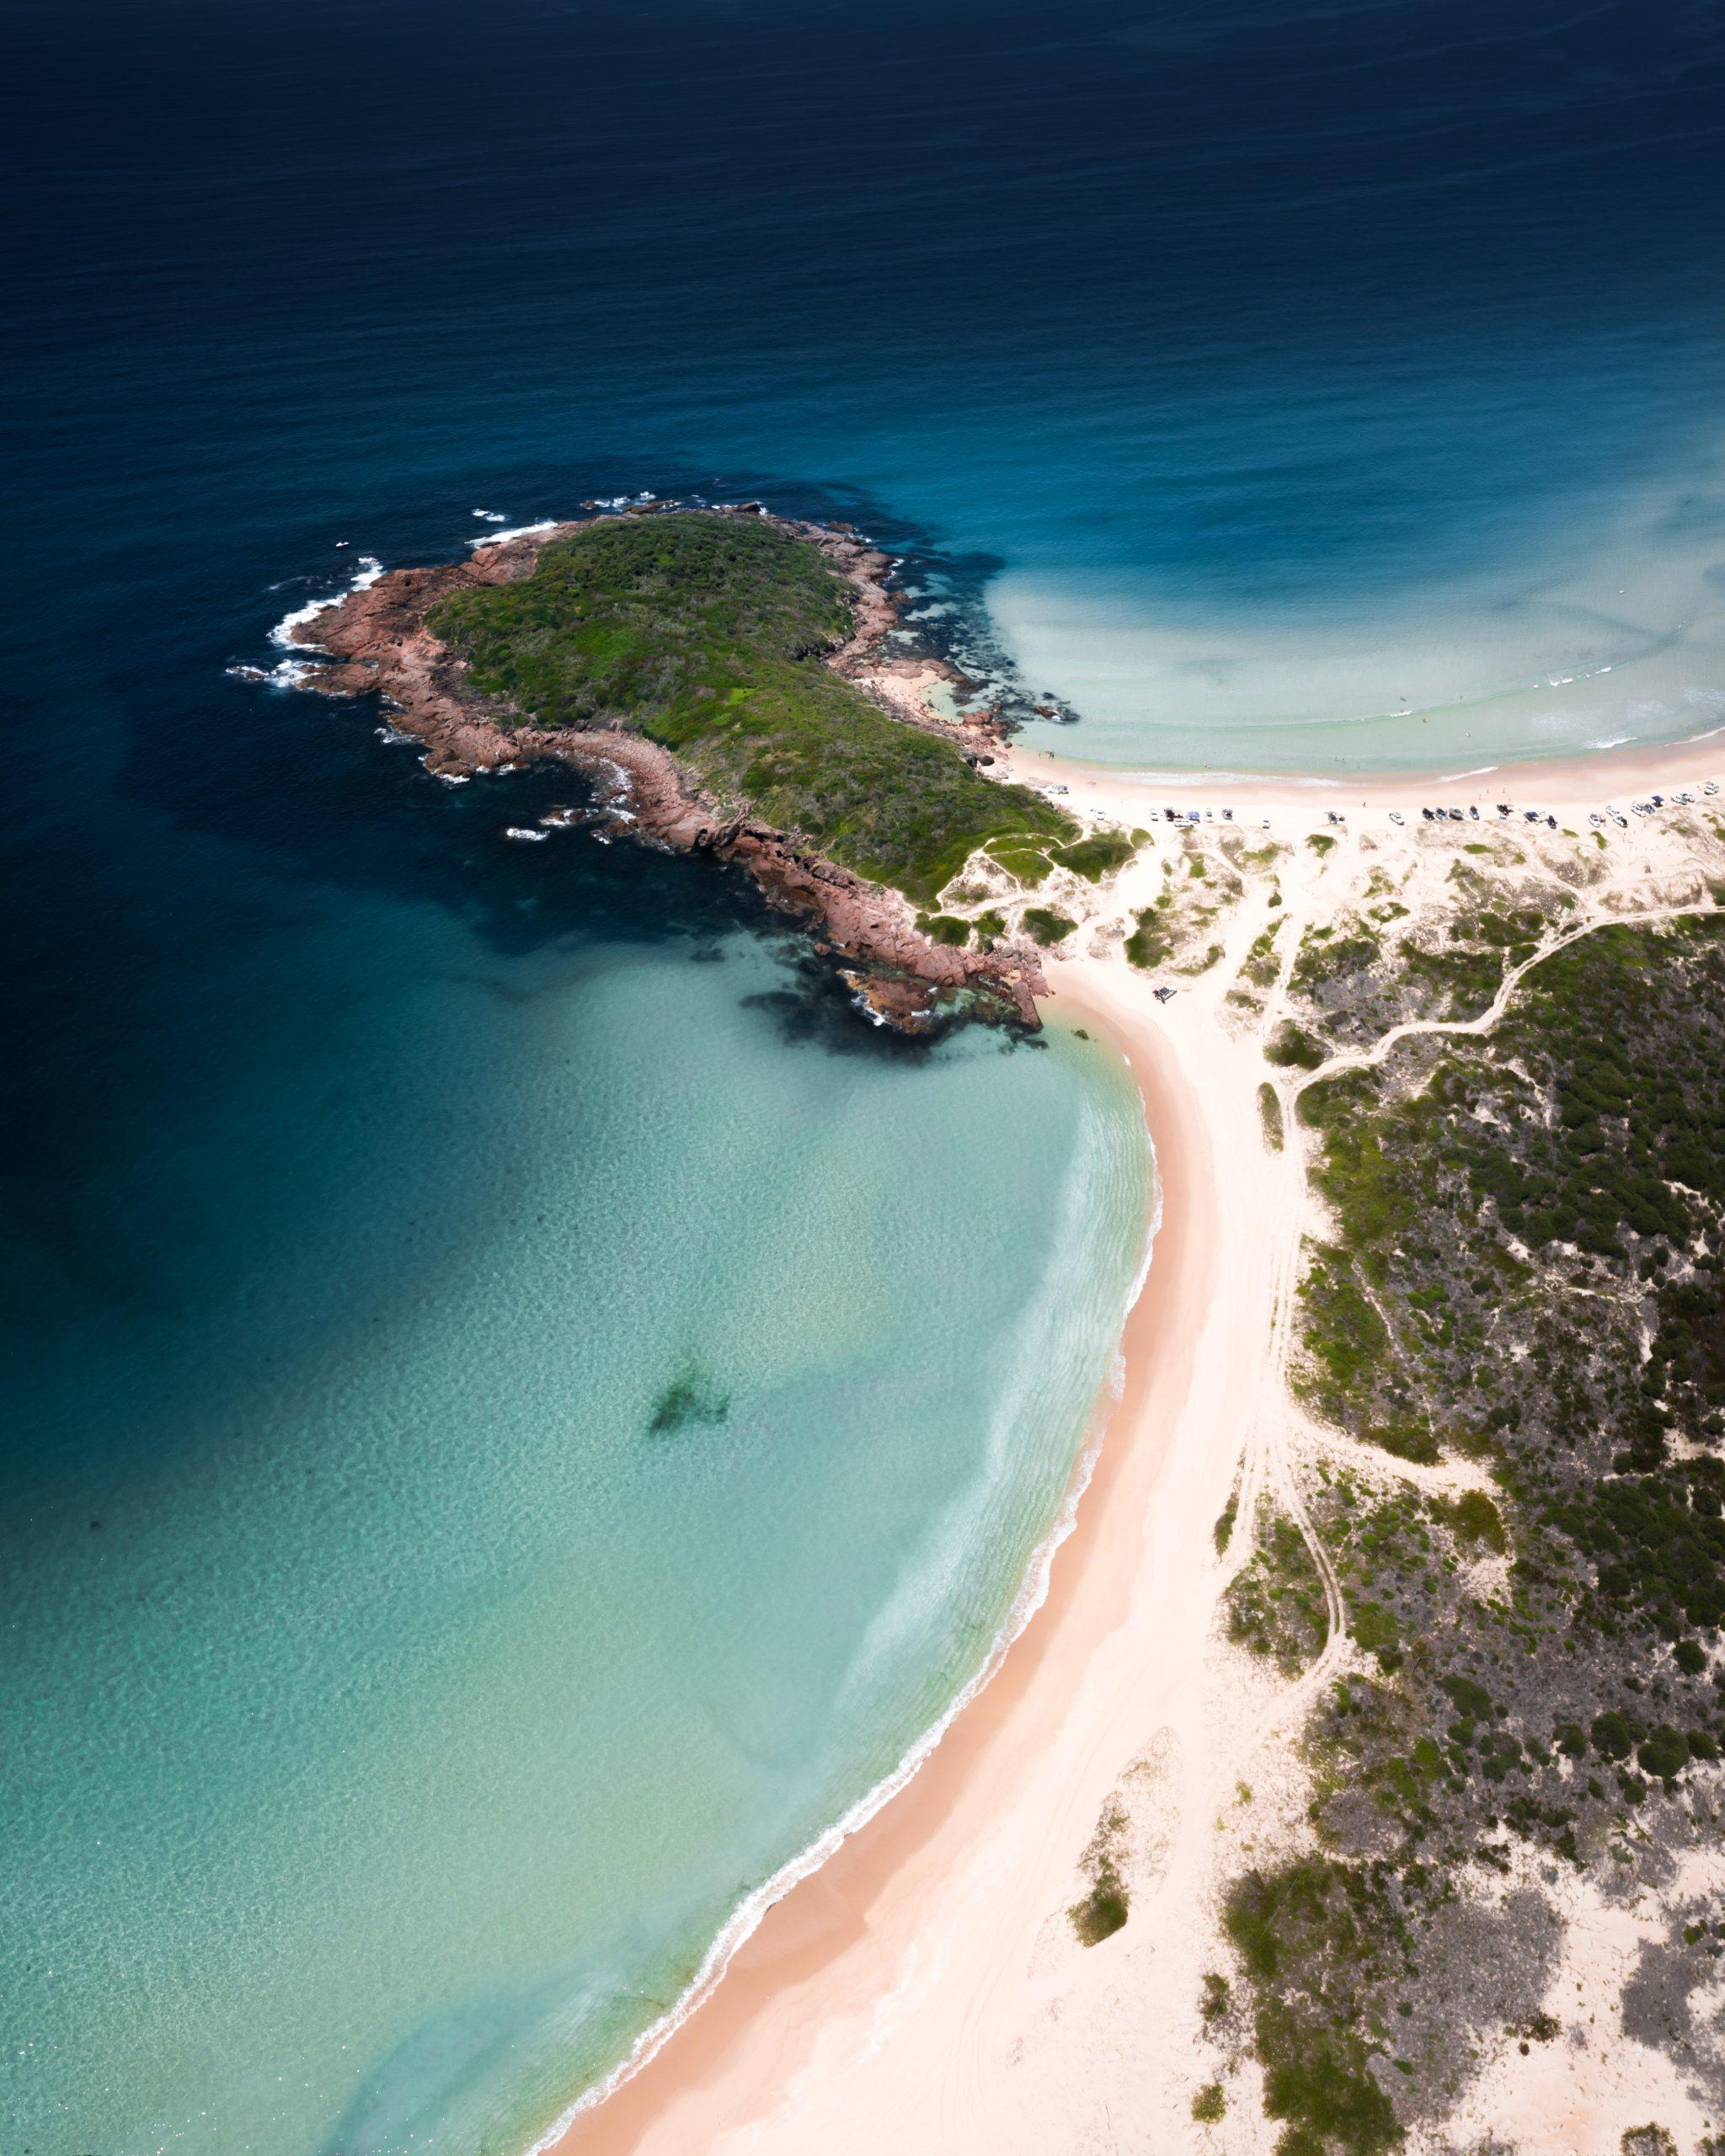 An island